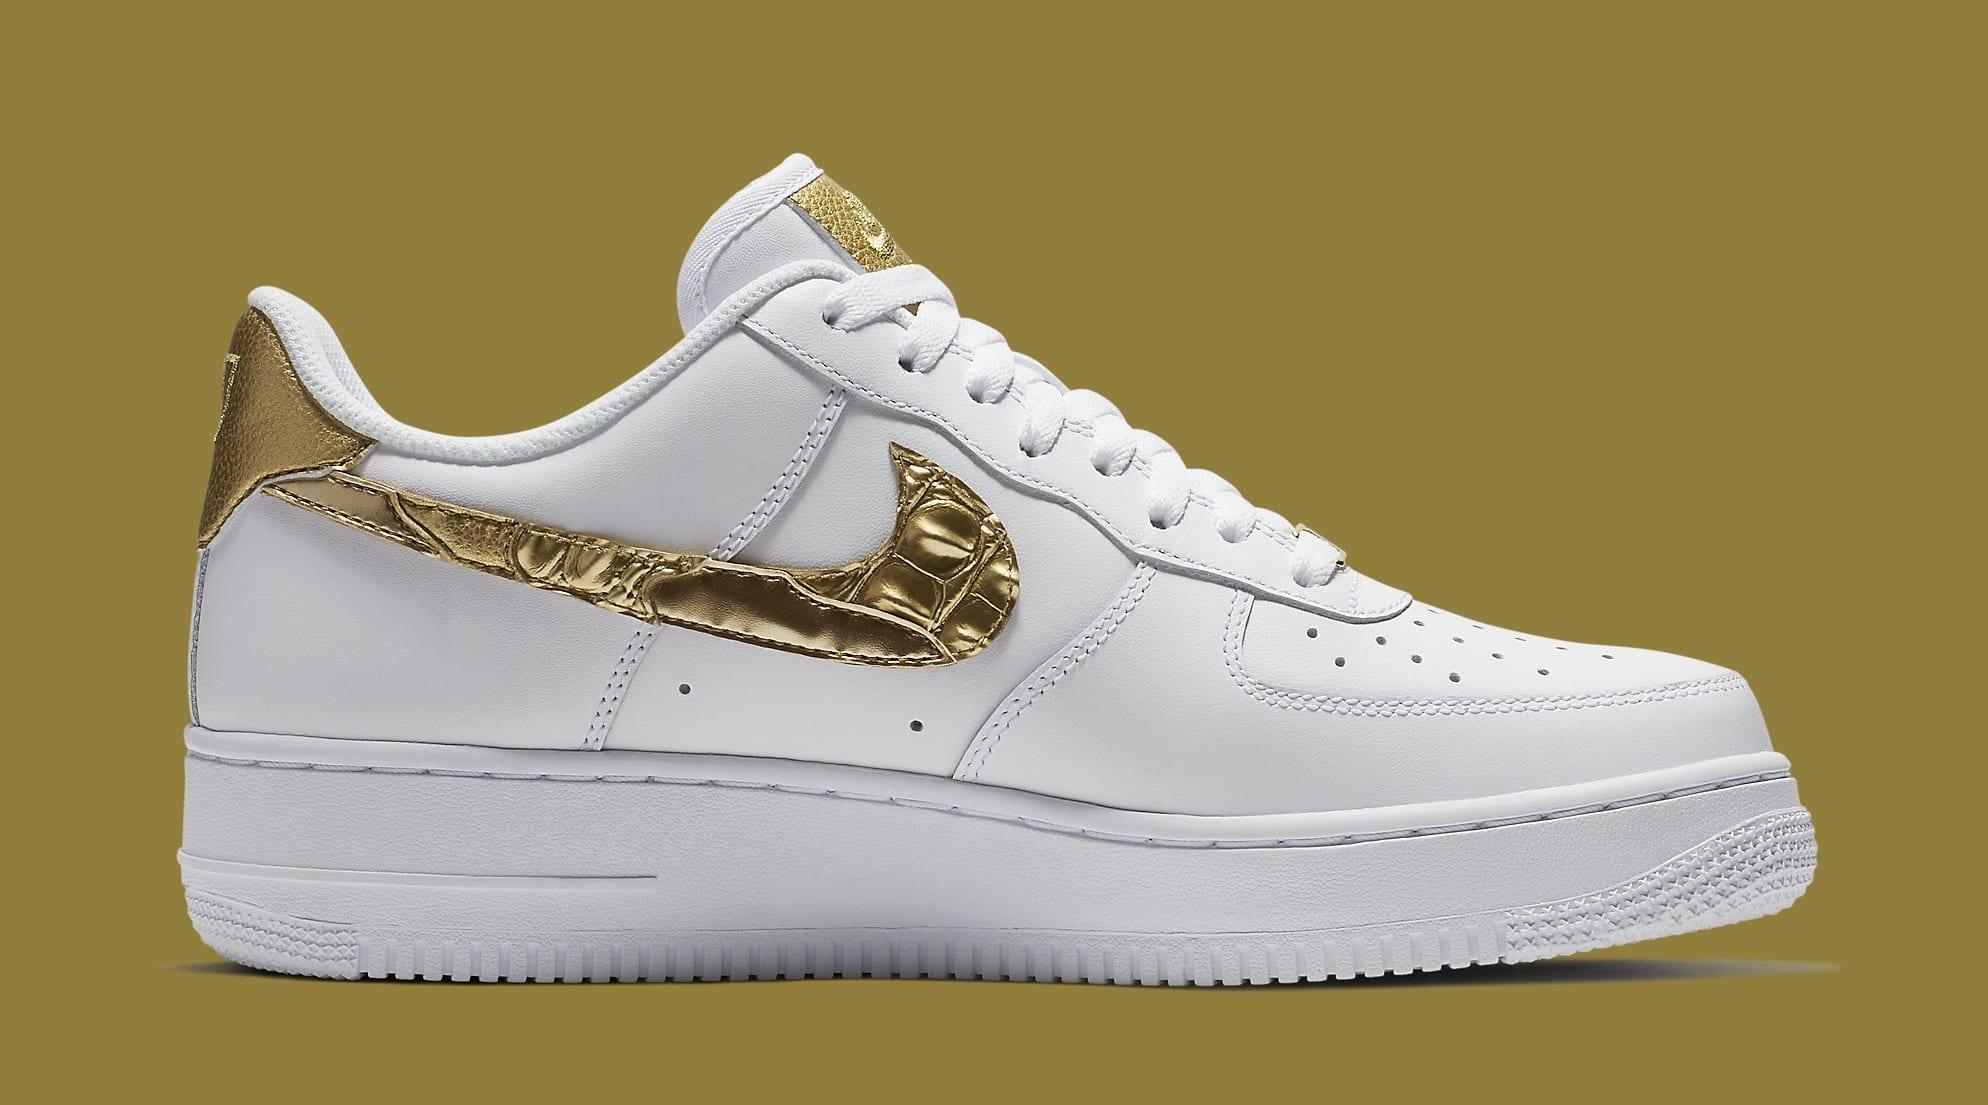 2018 Nike Air Force 1 Cristiano Ronaldo White AQ0666 100